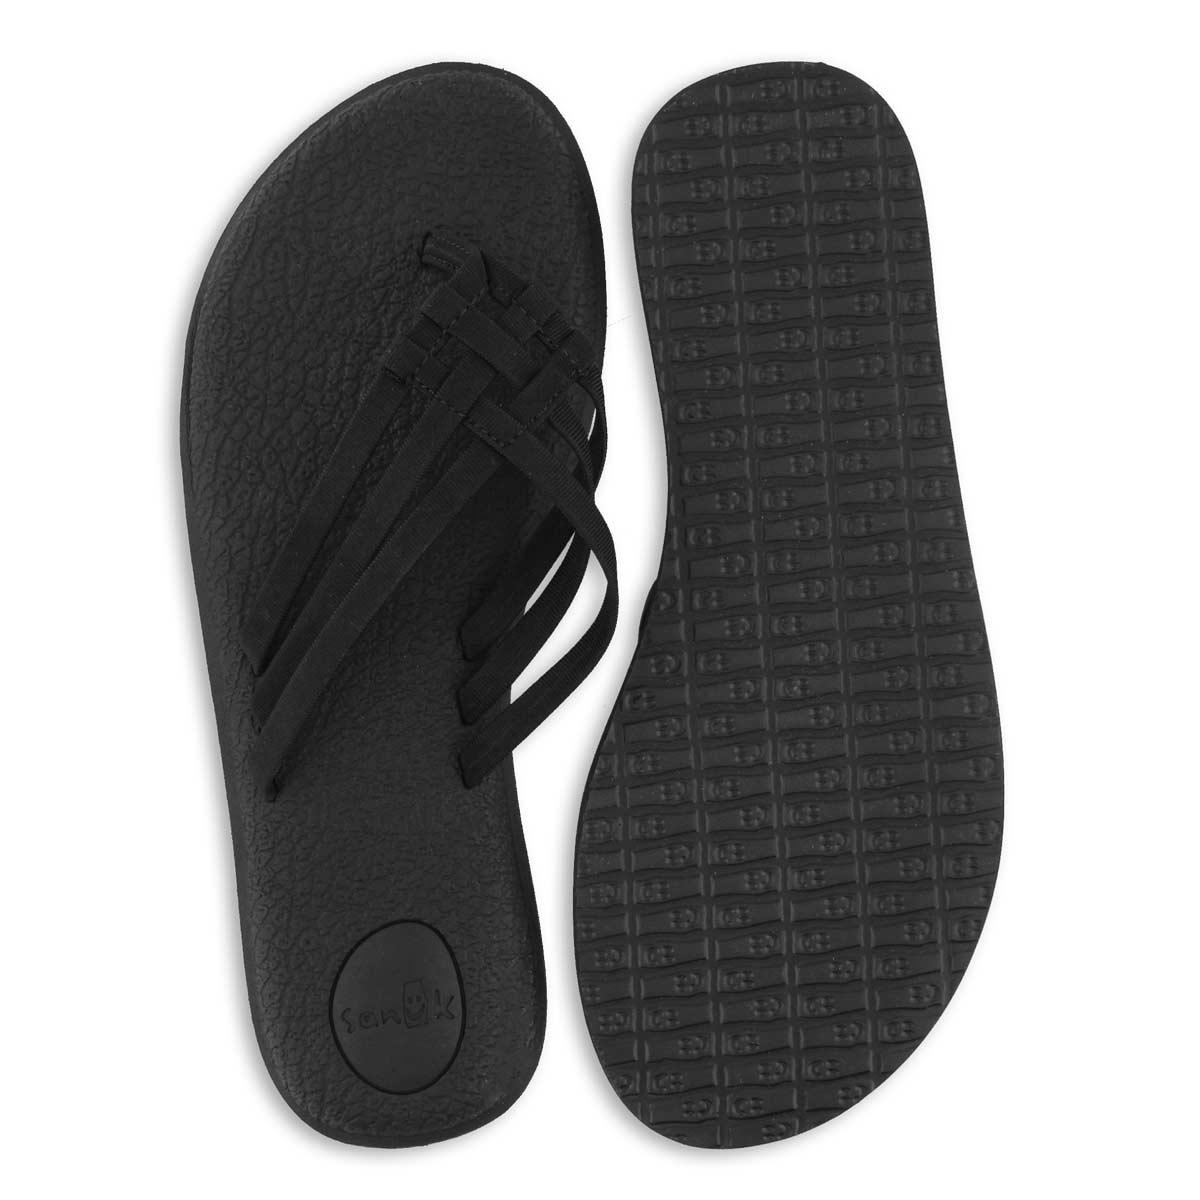 Lds Yoga Salty black flip flop